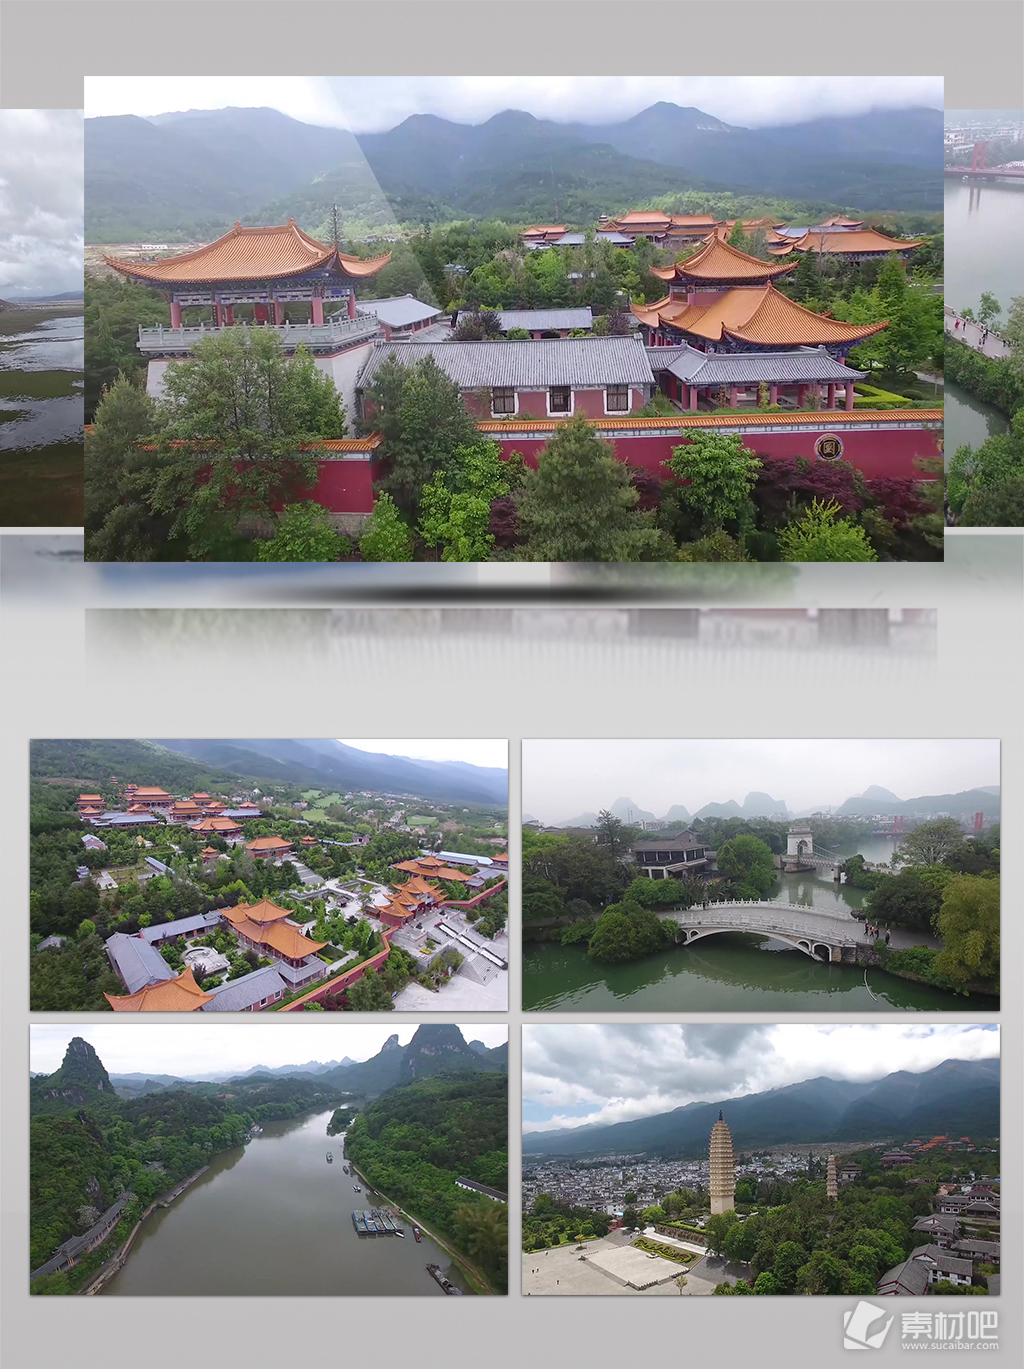 4K大美中国桂林大理旅游景观航拍风光